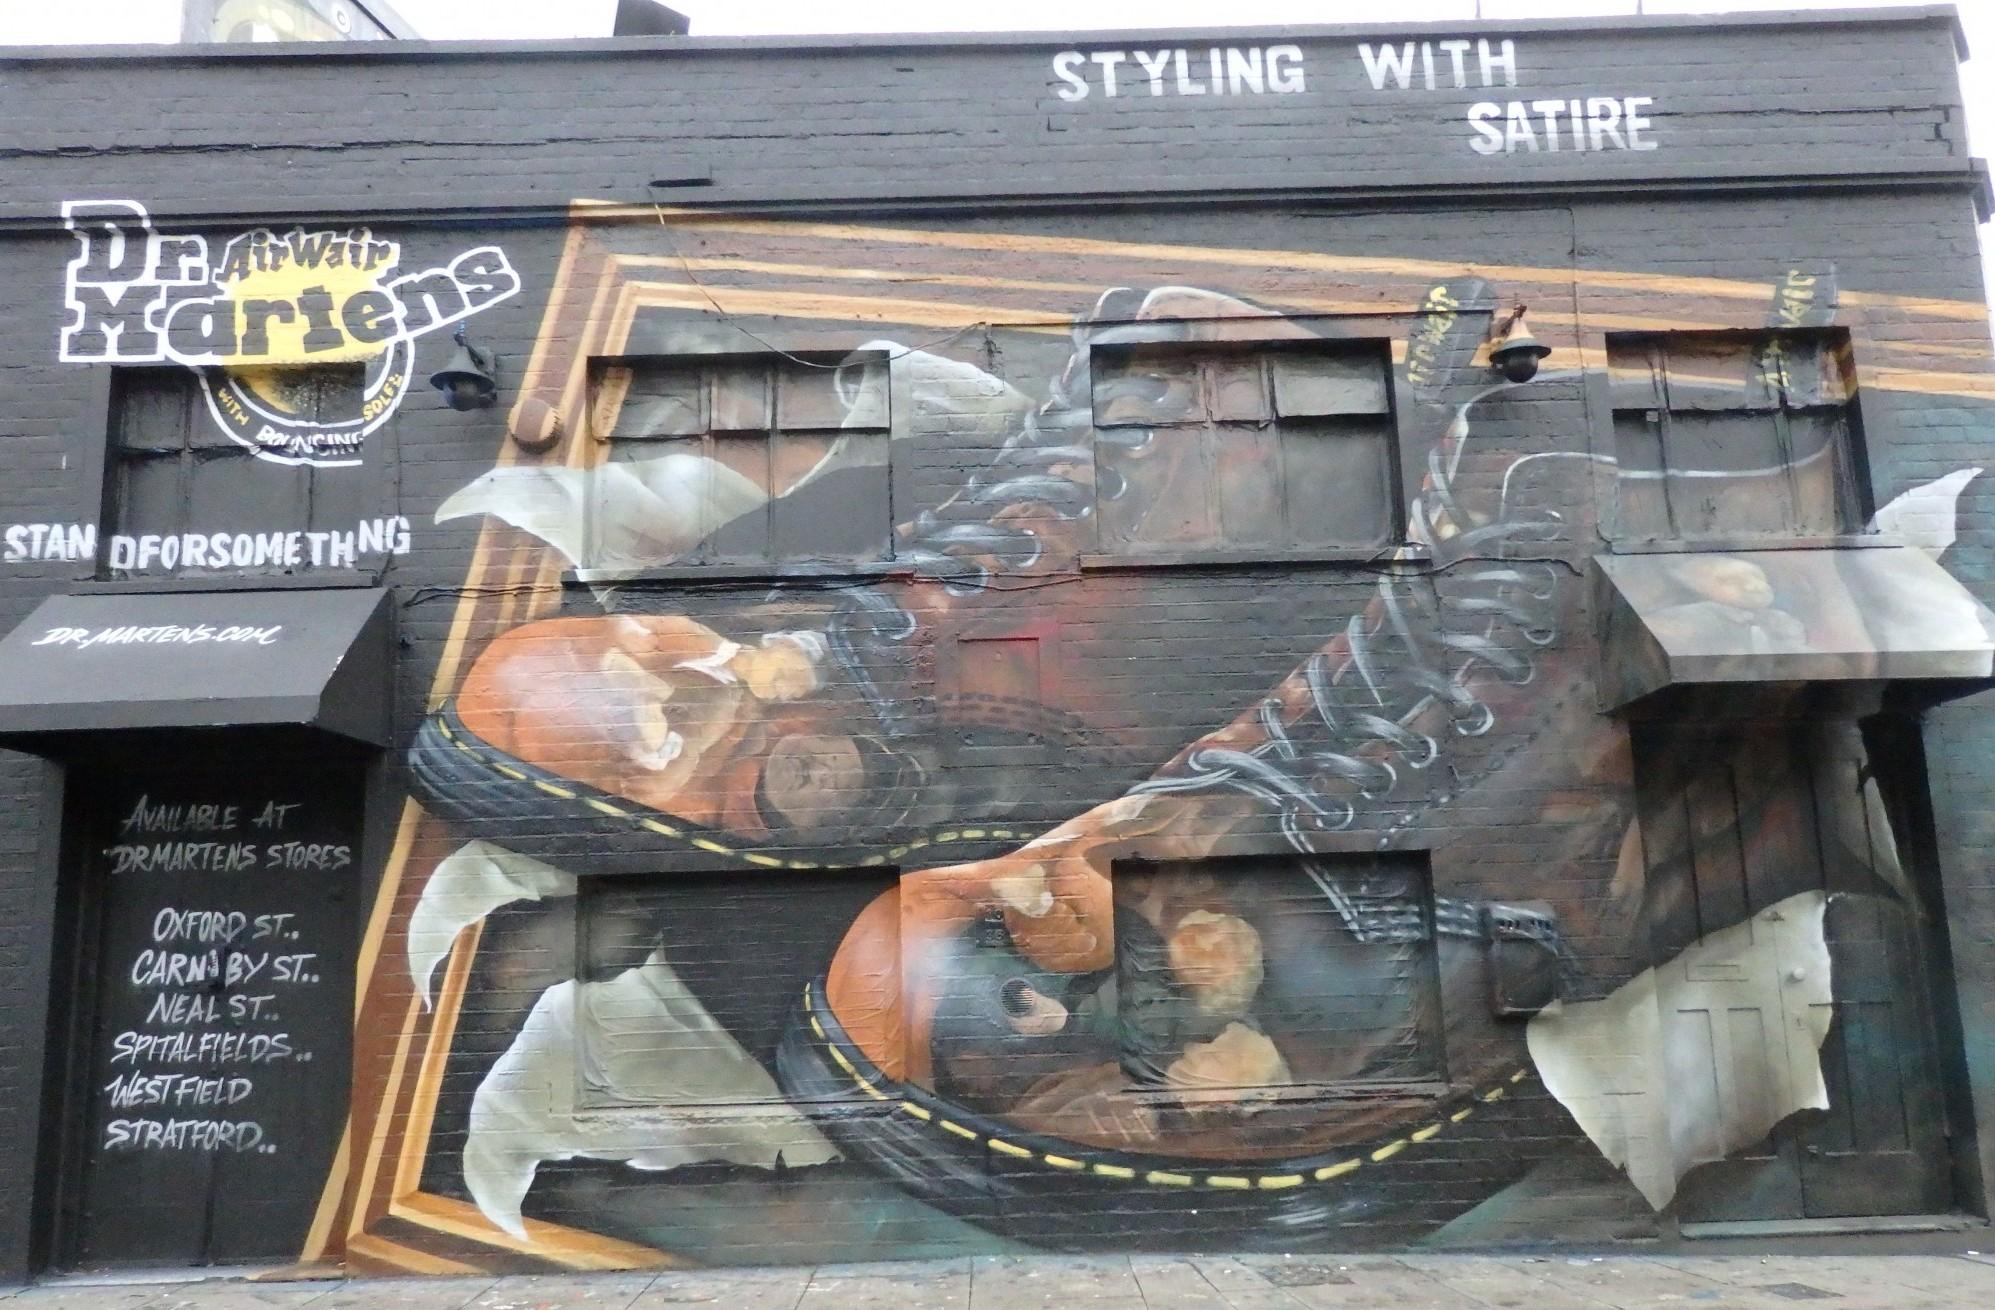 a Doc Martens store in Shoreditch, London